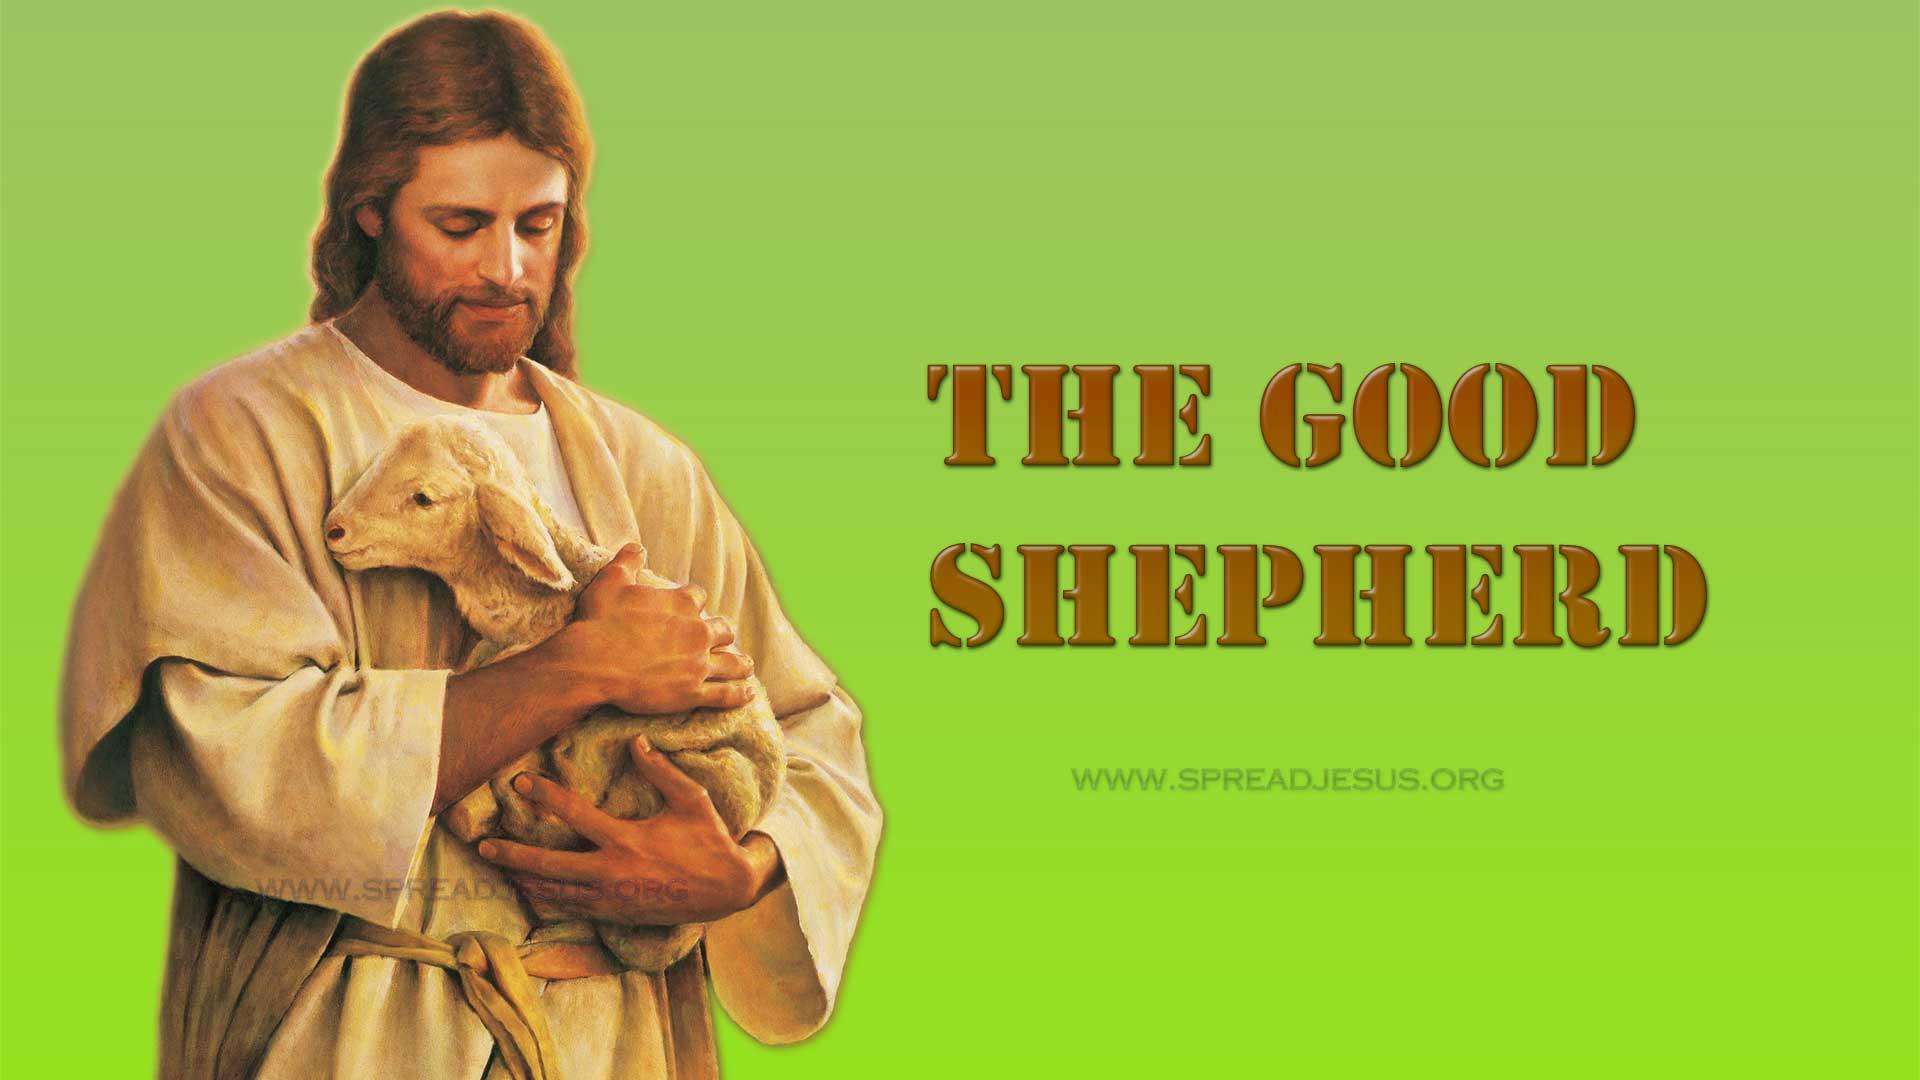 The Good Shepherd3:HD wallpapers